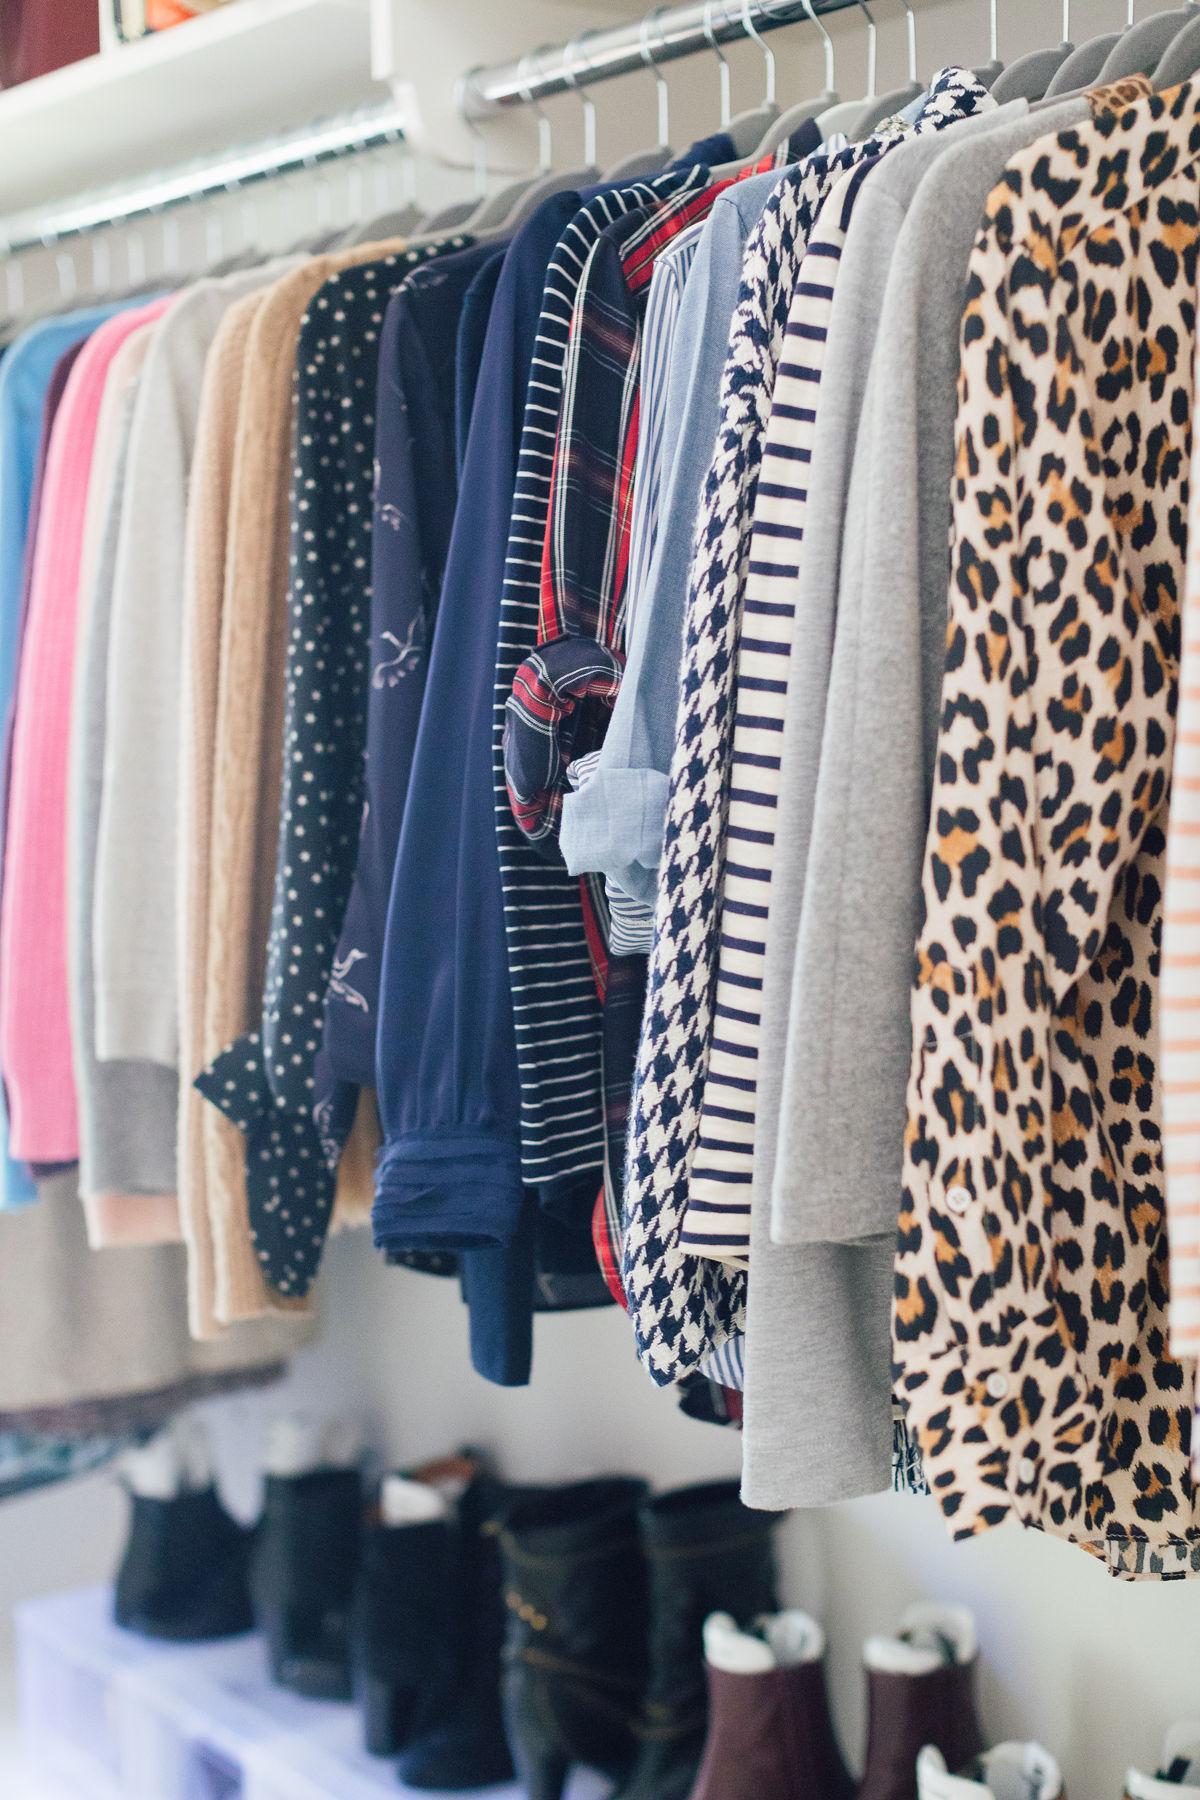 Closet organizing home organizer professional wardrobe